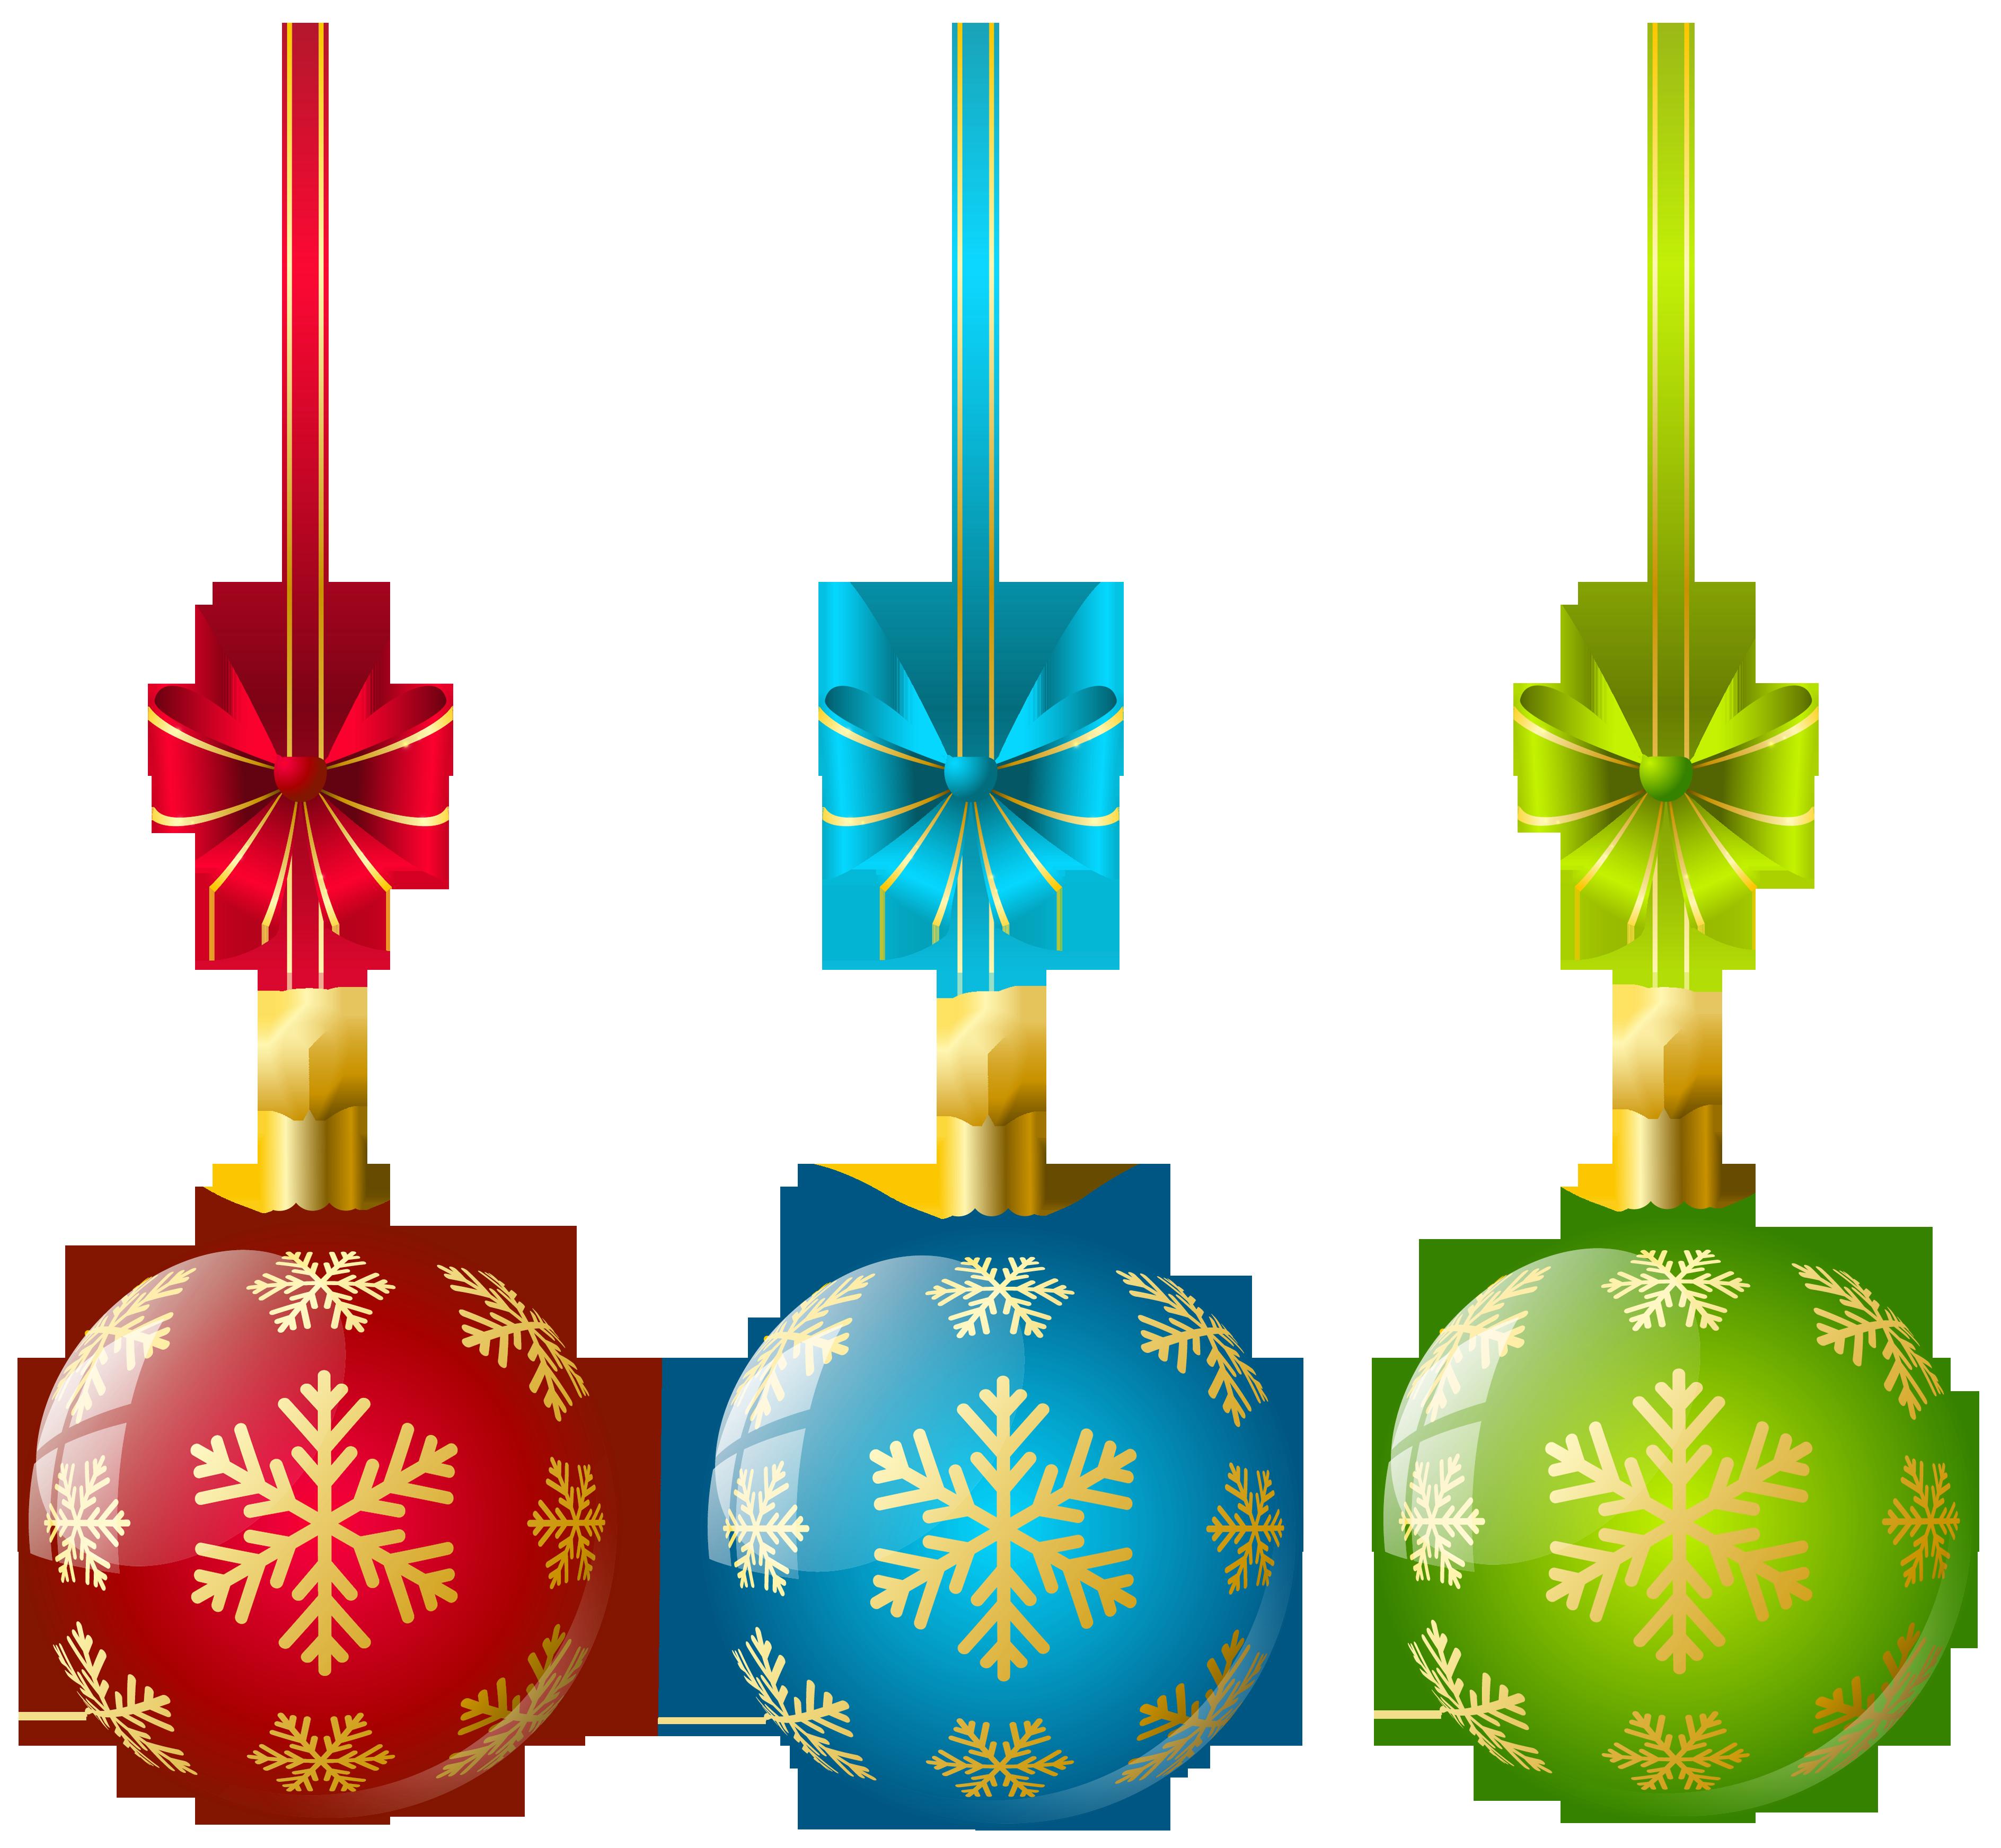 Christmas Ornament Clip Art Cliparts Co-Christmas Ornament Clip Art Cliparts Co-9